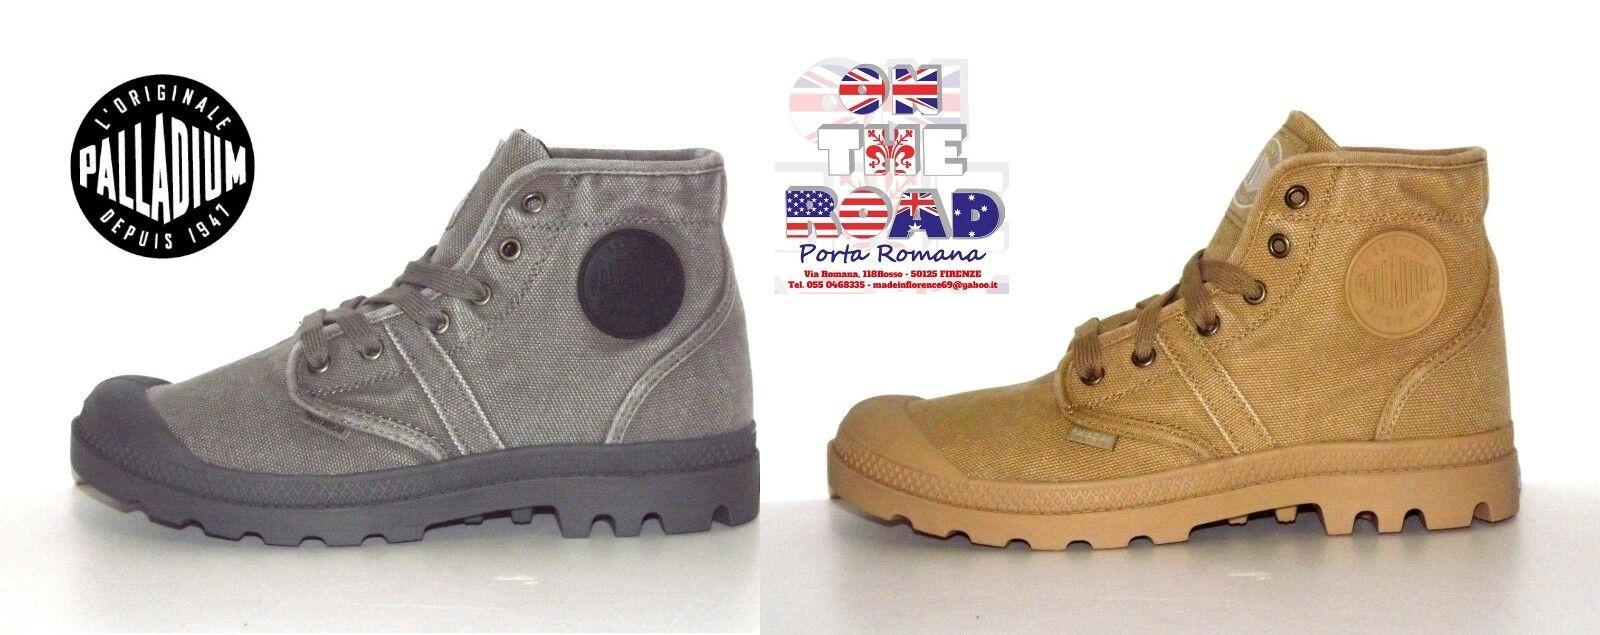 SCONTO SCONTO SCONTO 20% PALLADIUM botas PALLABROUSE 42 43 46 STIVALETTI zapatos zapatillas 5e360f